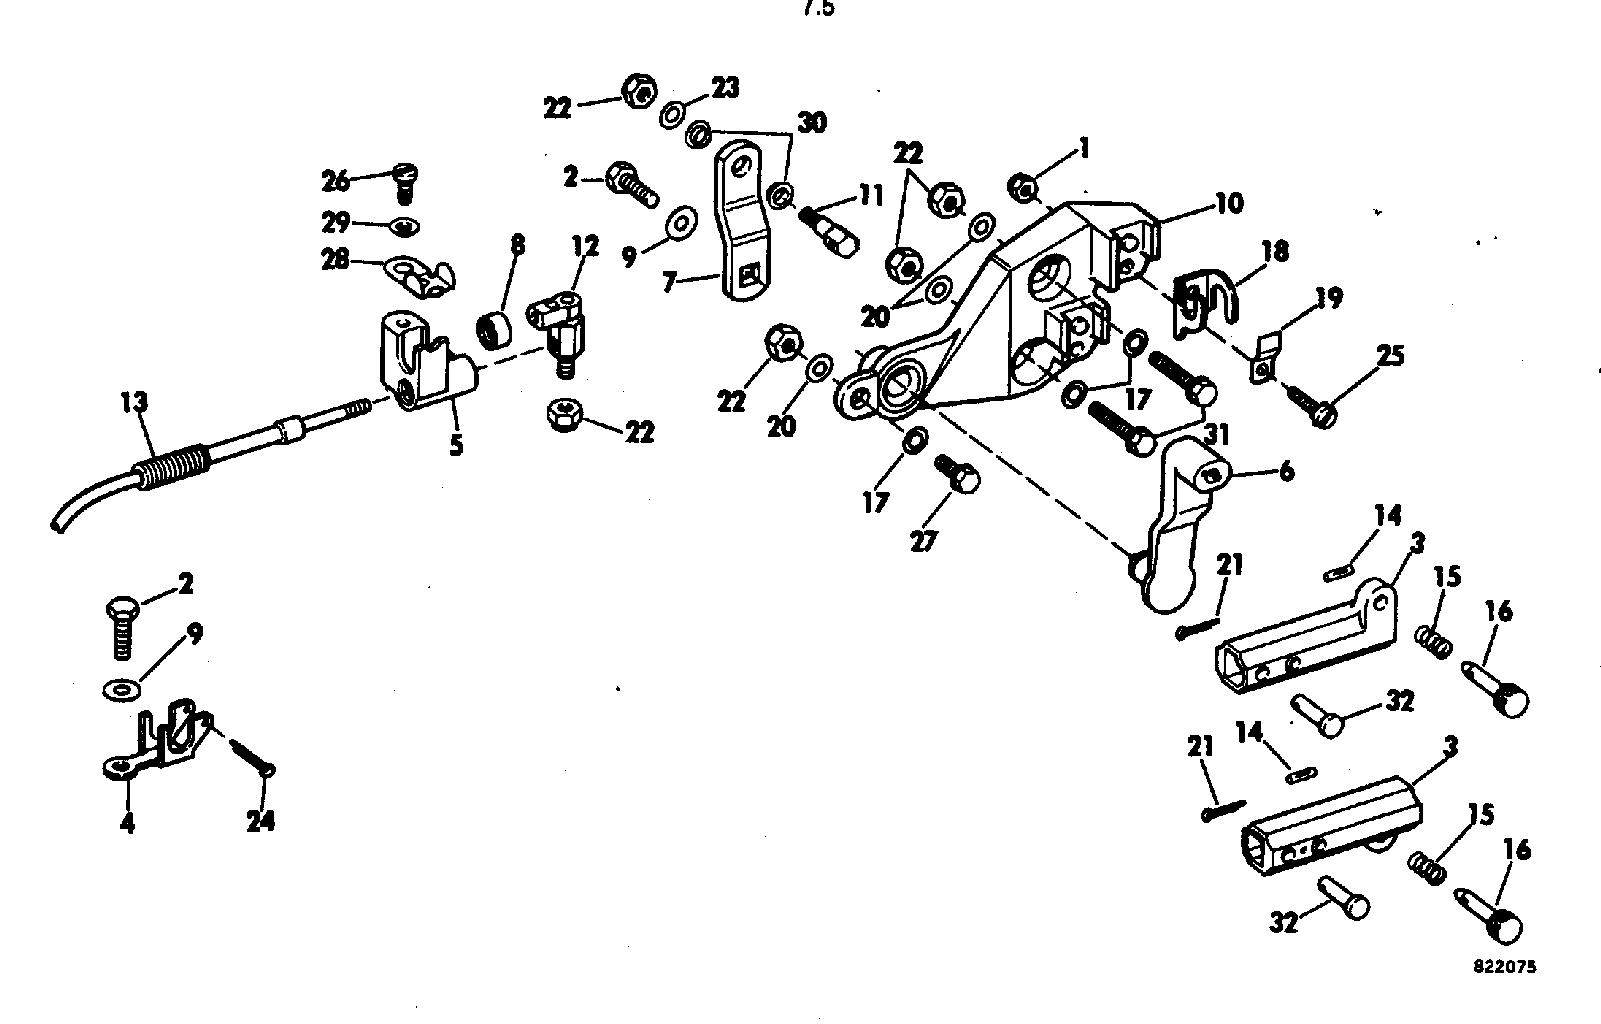 remote control adaptor kit 7.5 Remote Control 1982